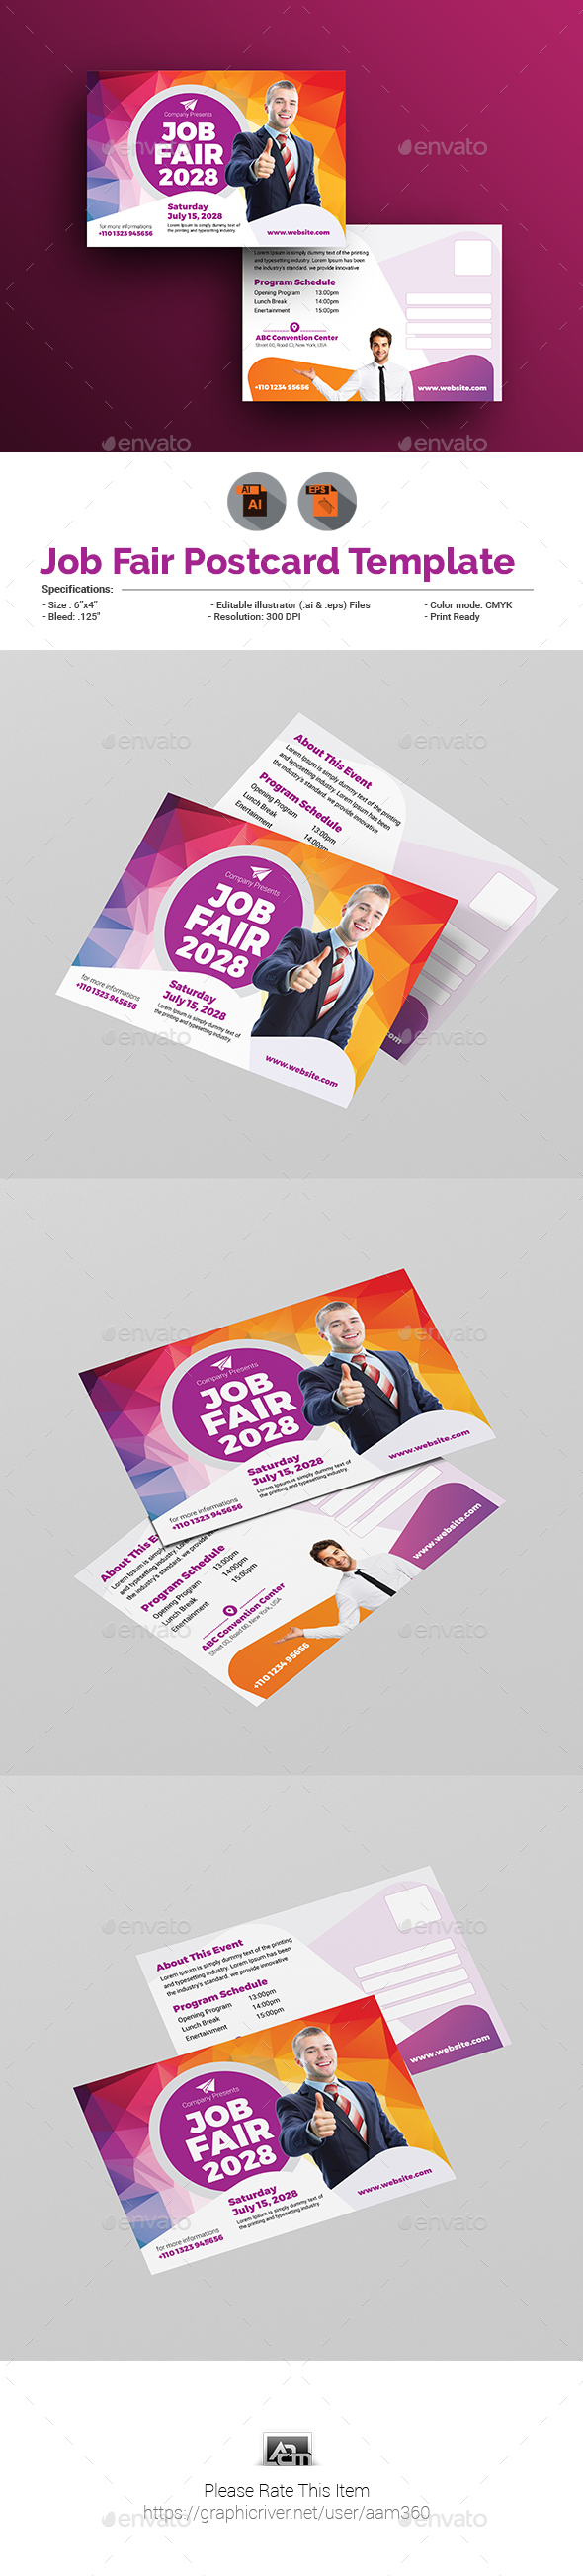 Job Fair Postcard Template